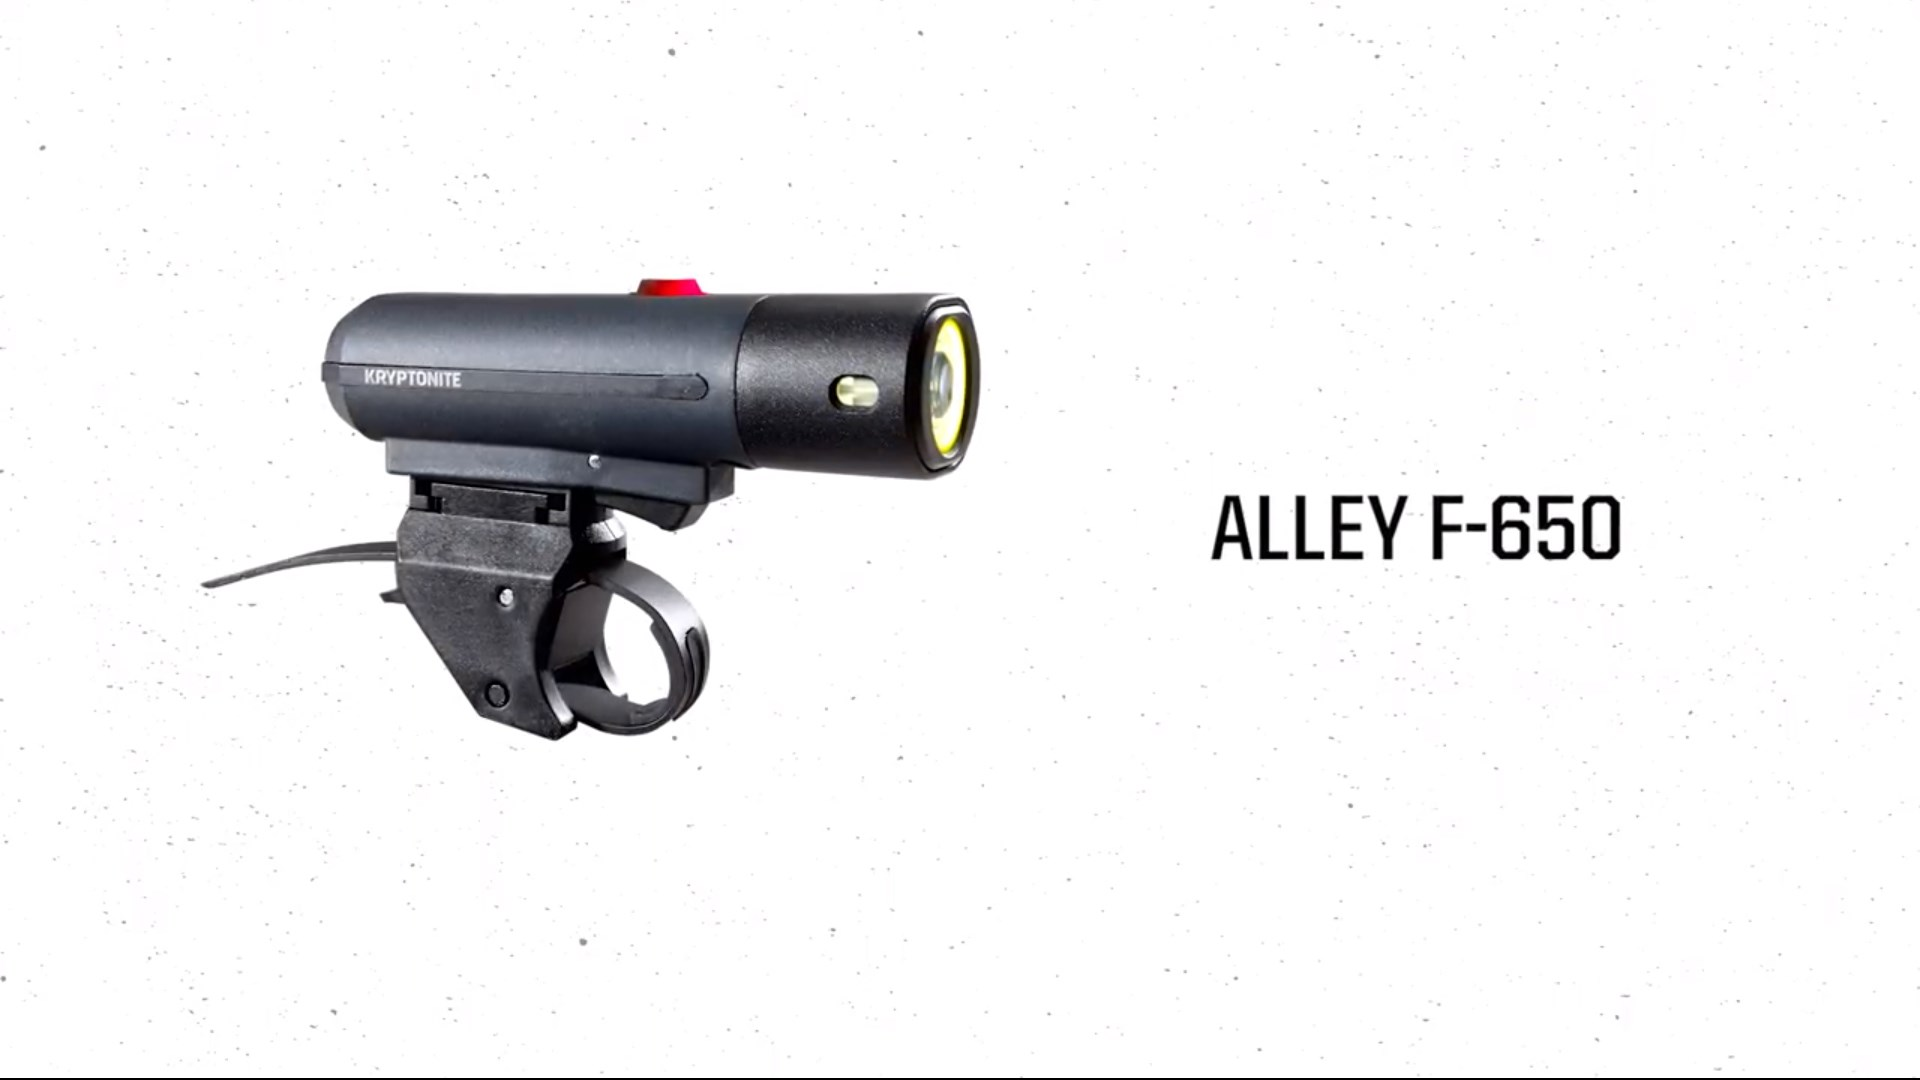 Kryptonite Alley F-650 Premium USB Front Light